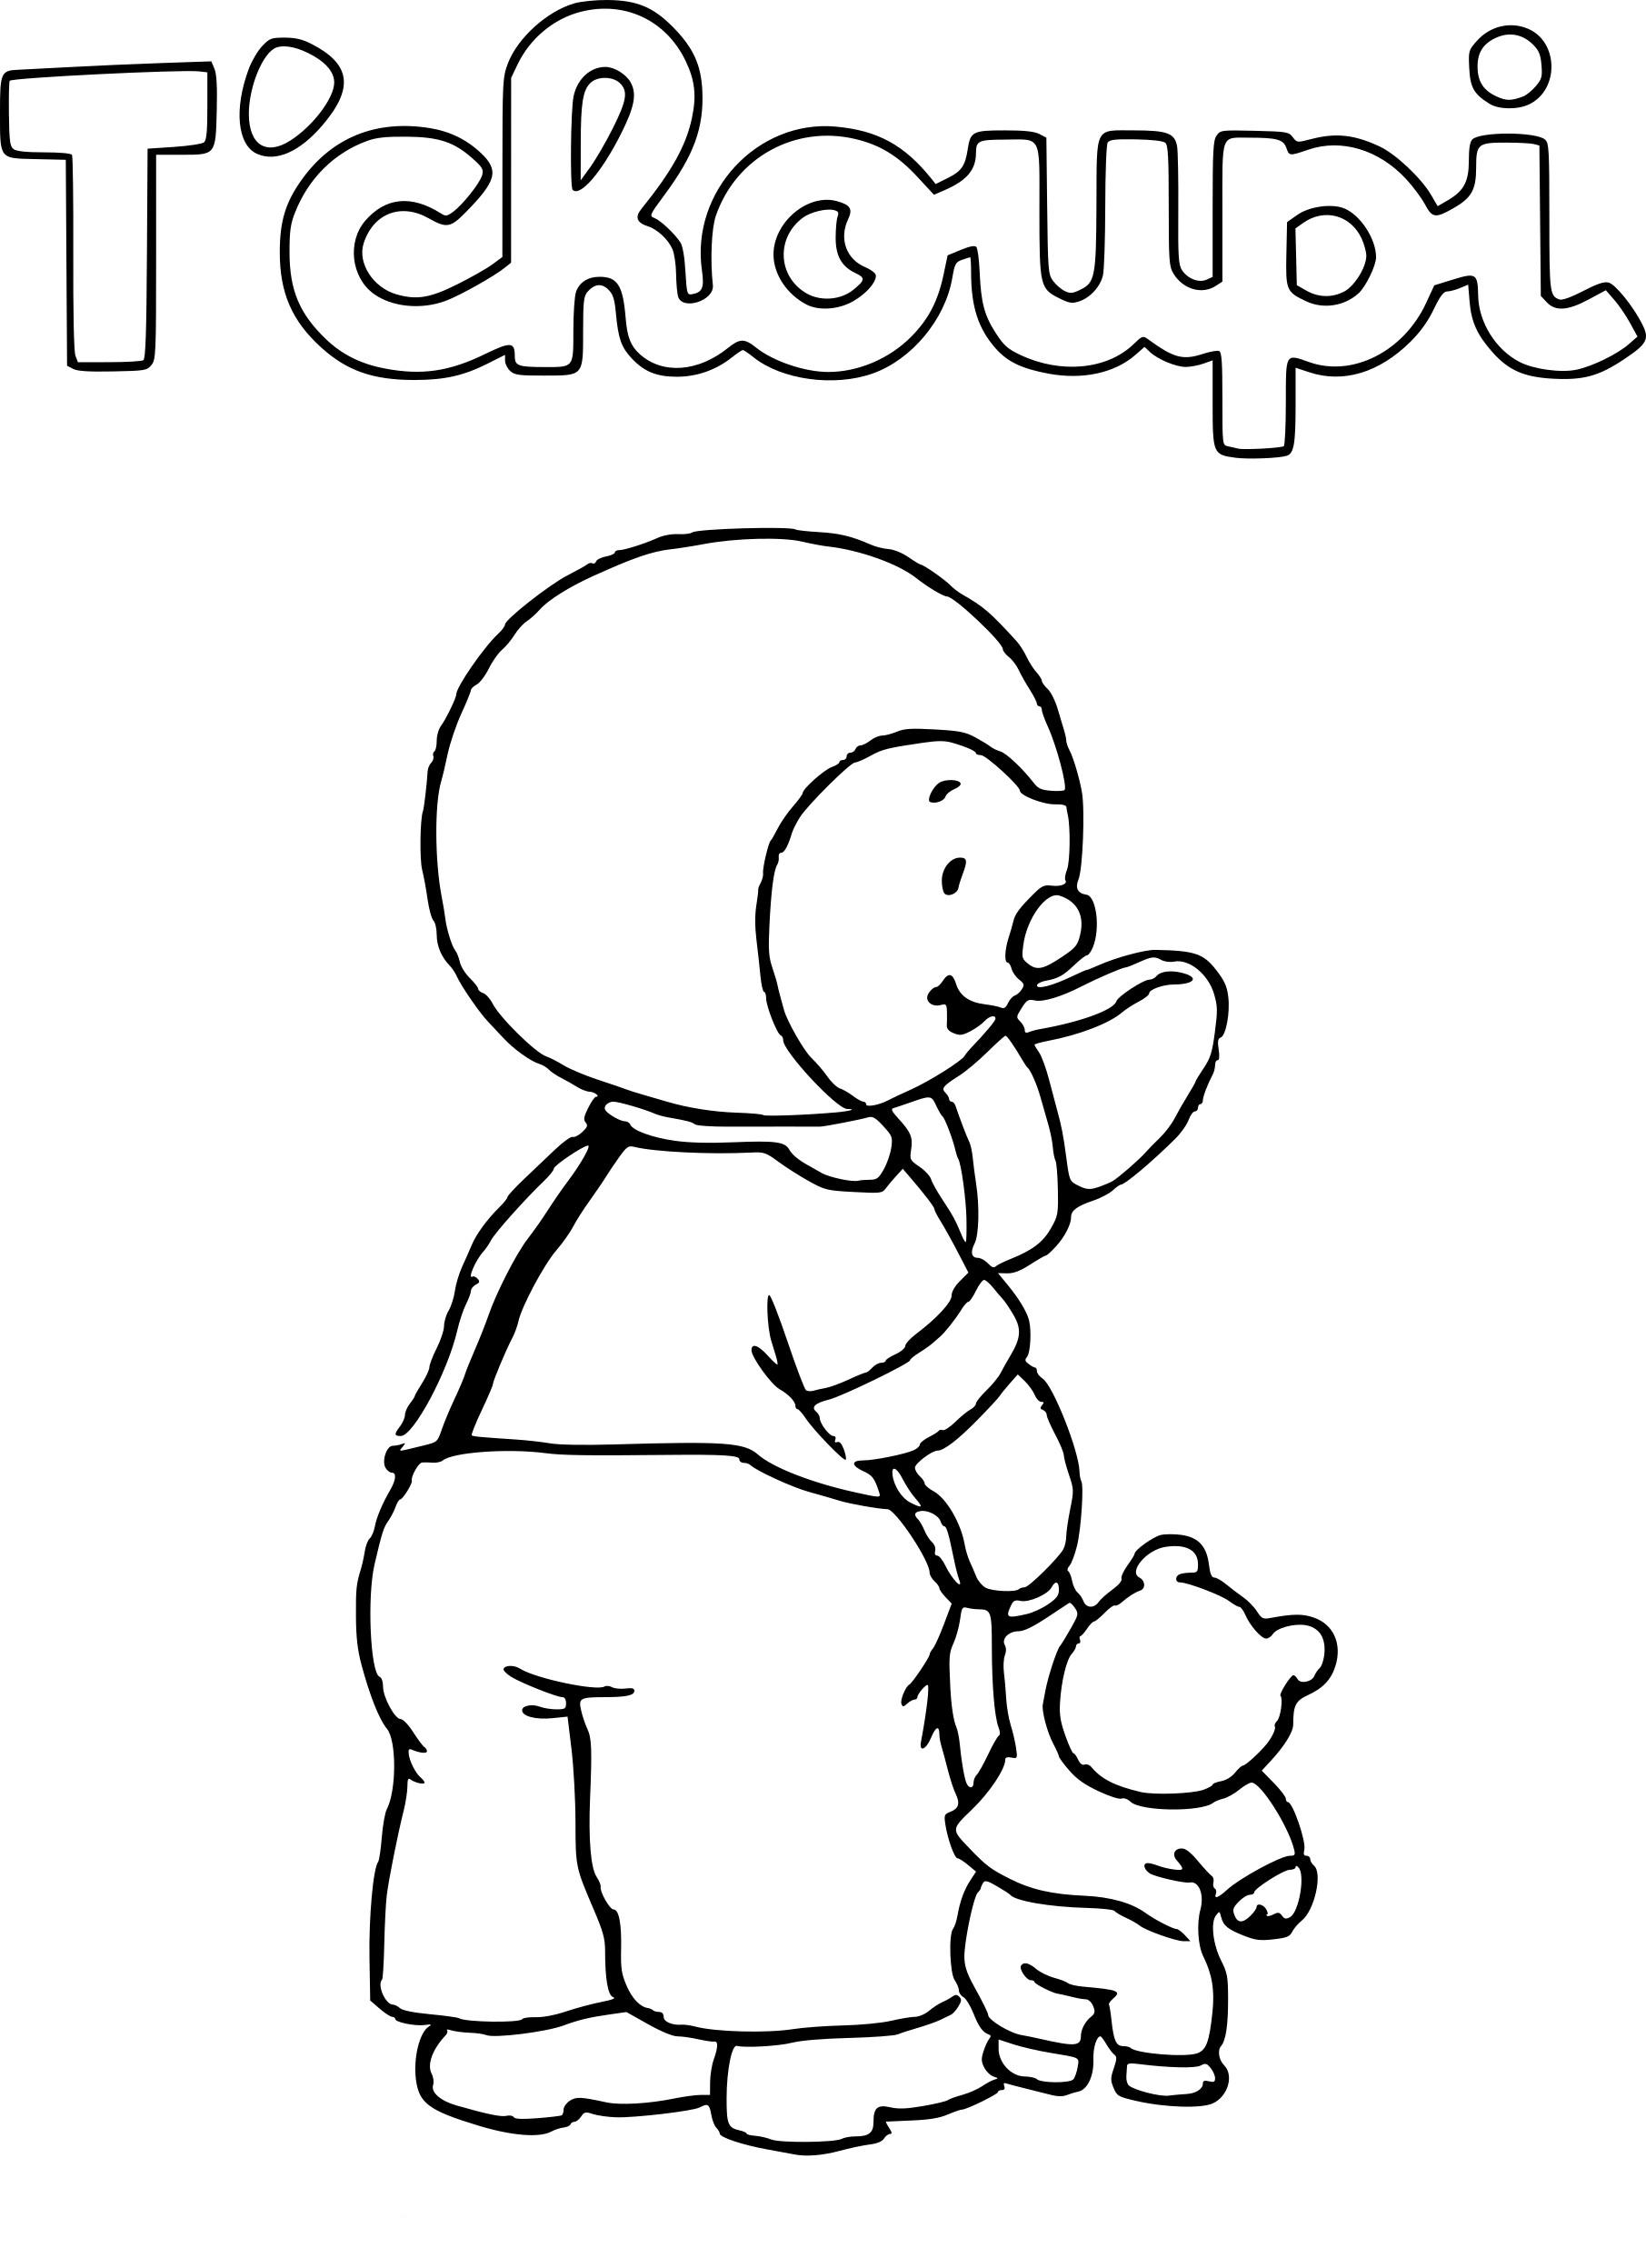 Tchoupi dessin